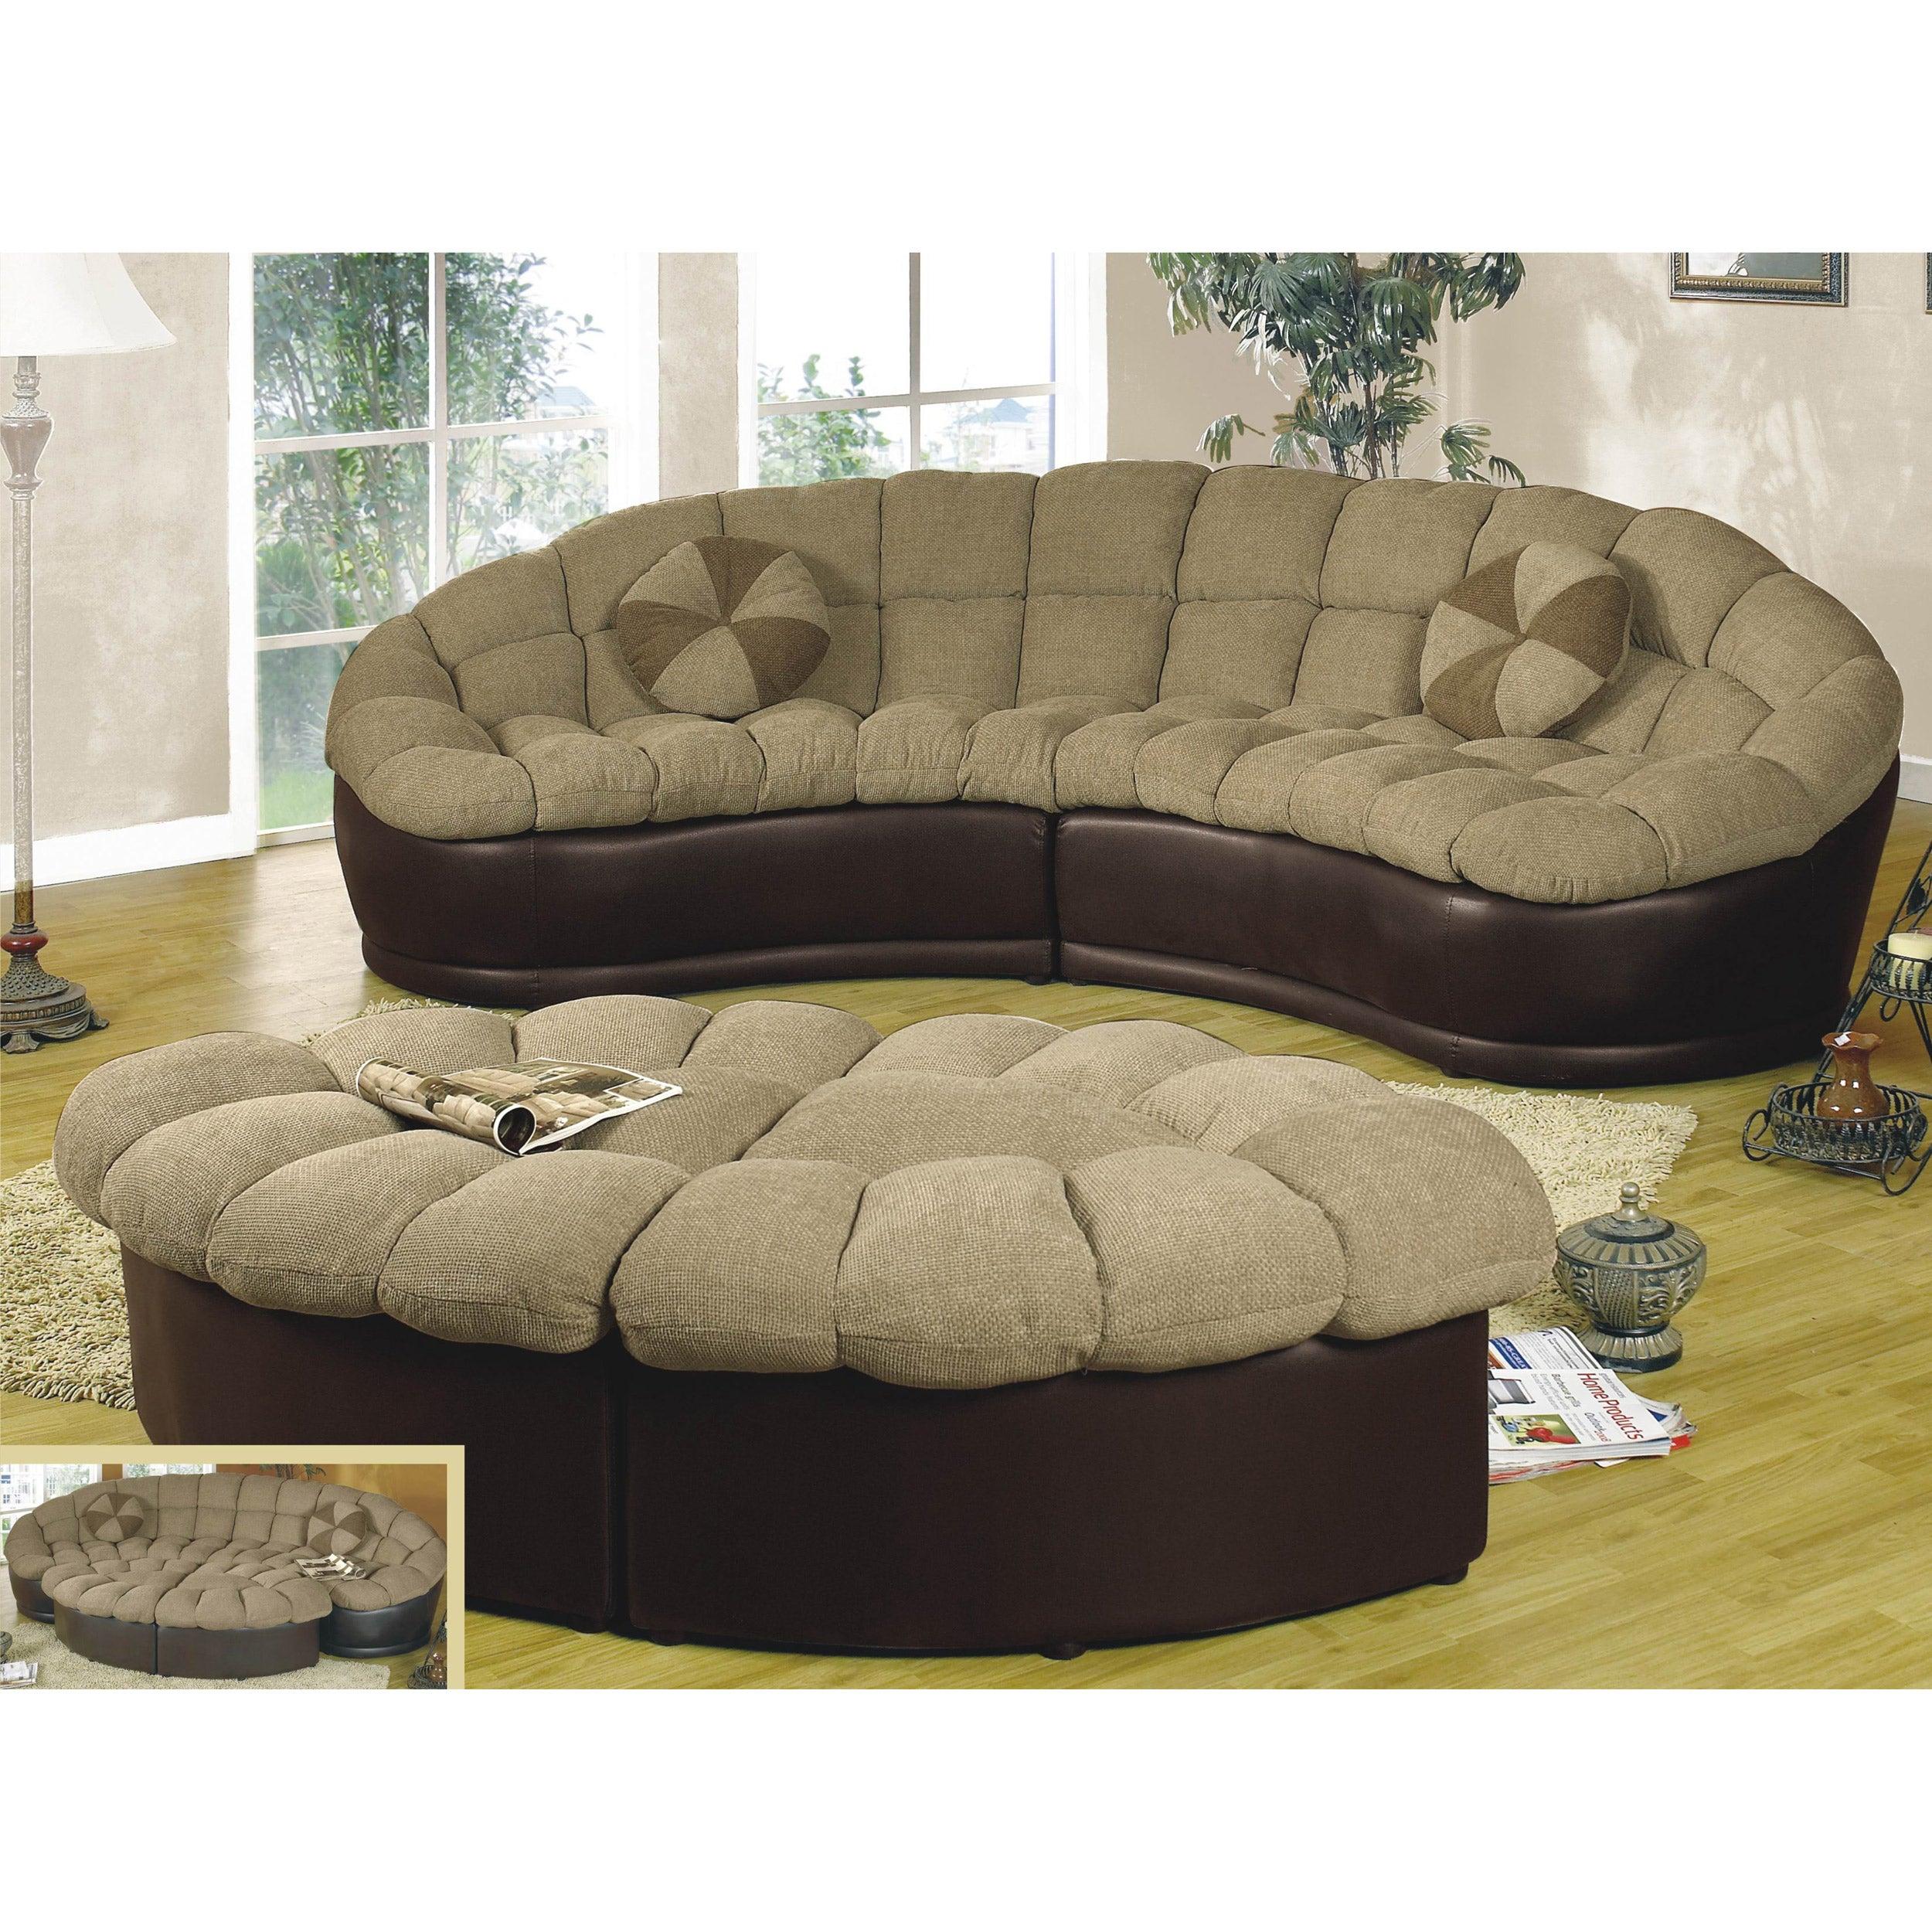 Papasan Two Piece Sectional Sofa Free Shipping Today 5913709